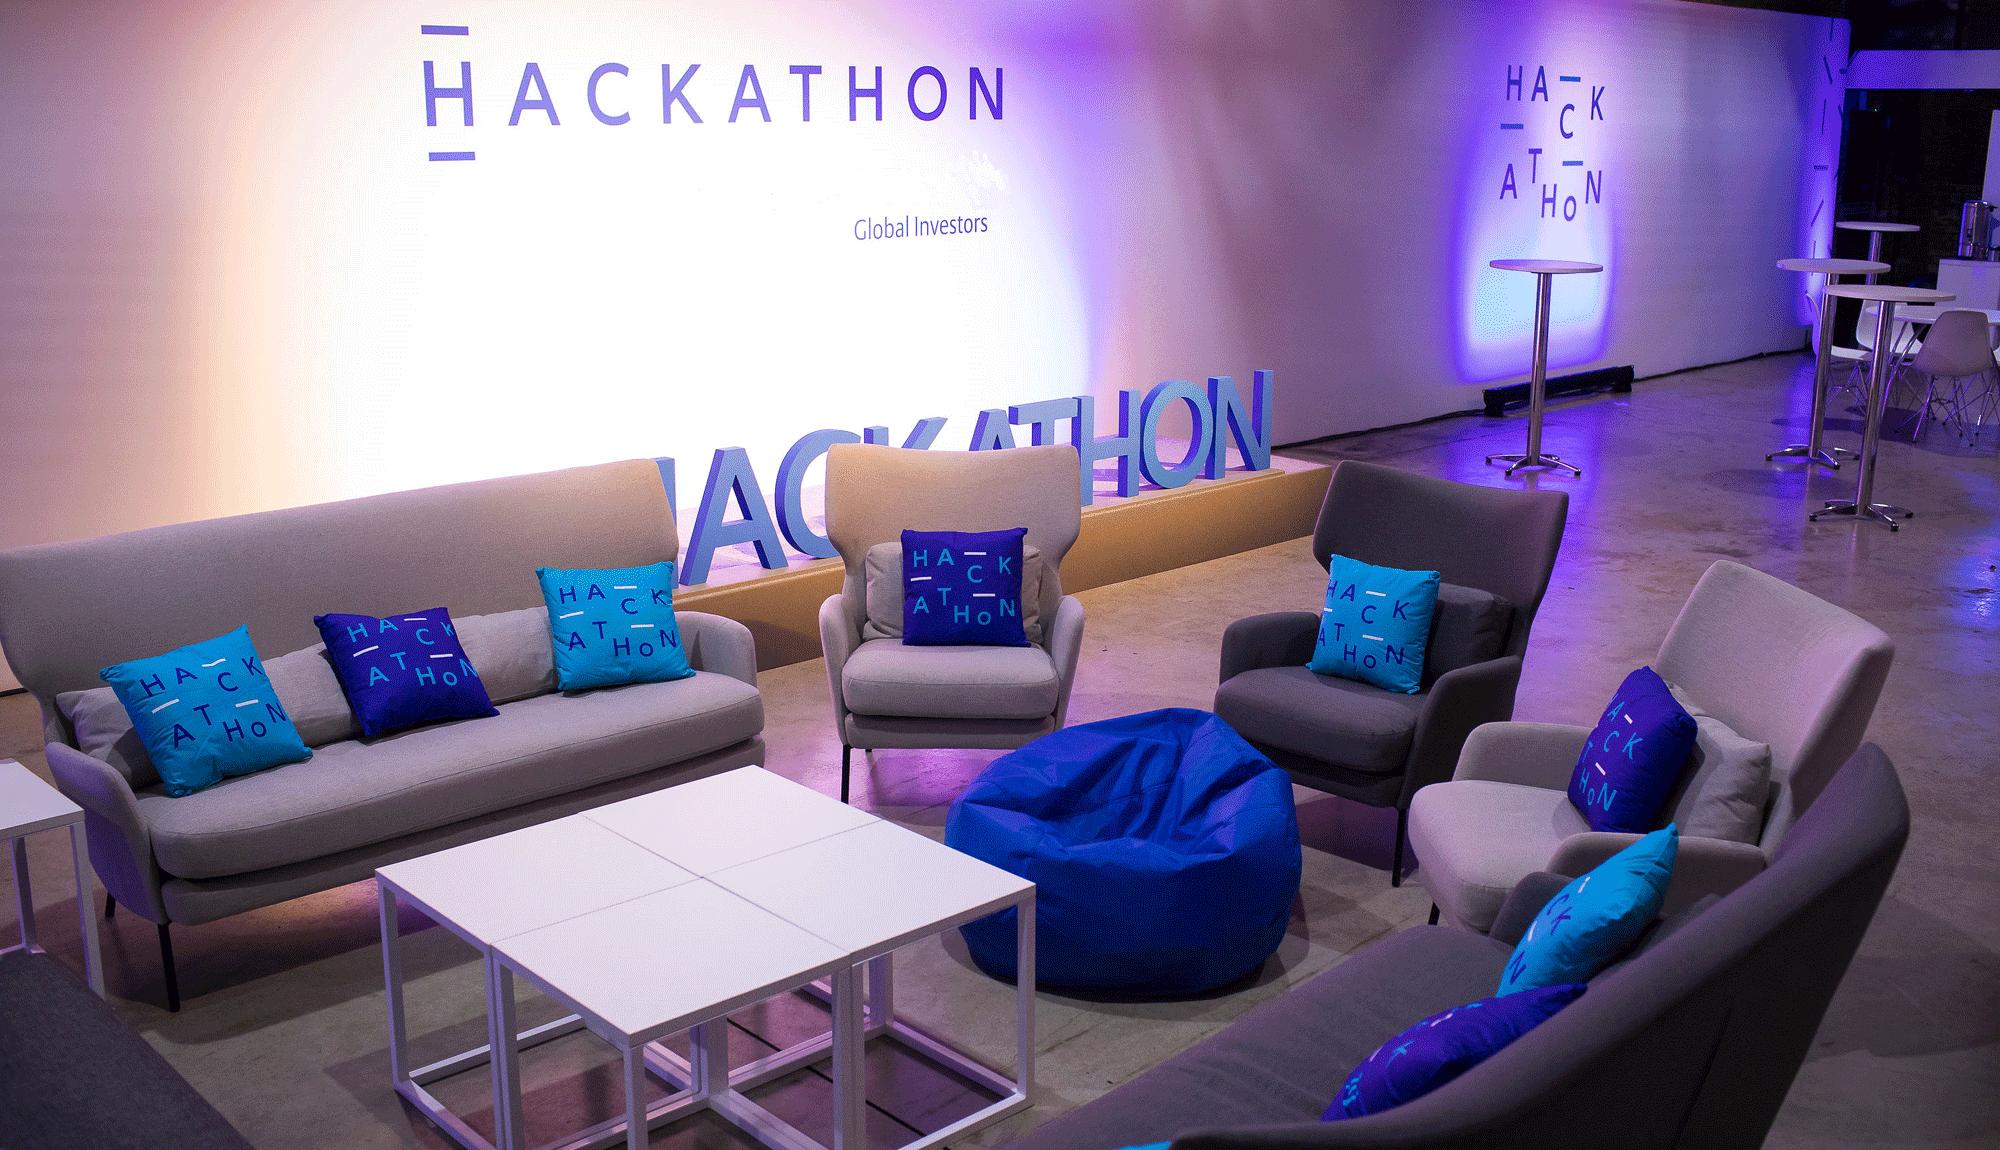 Hackathon-at-Behind-the-Bike-Shed-4